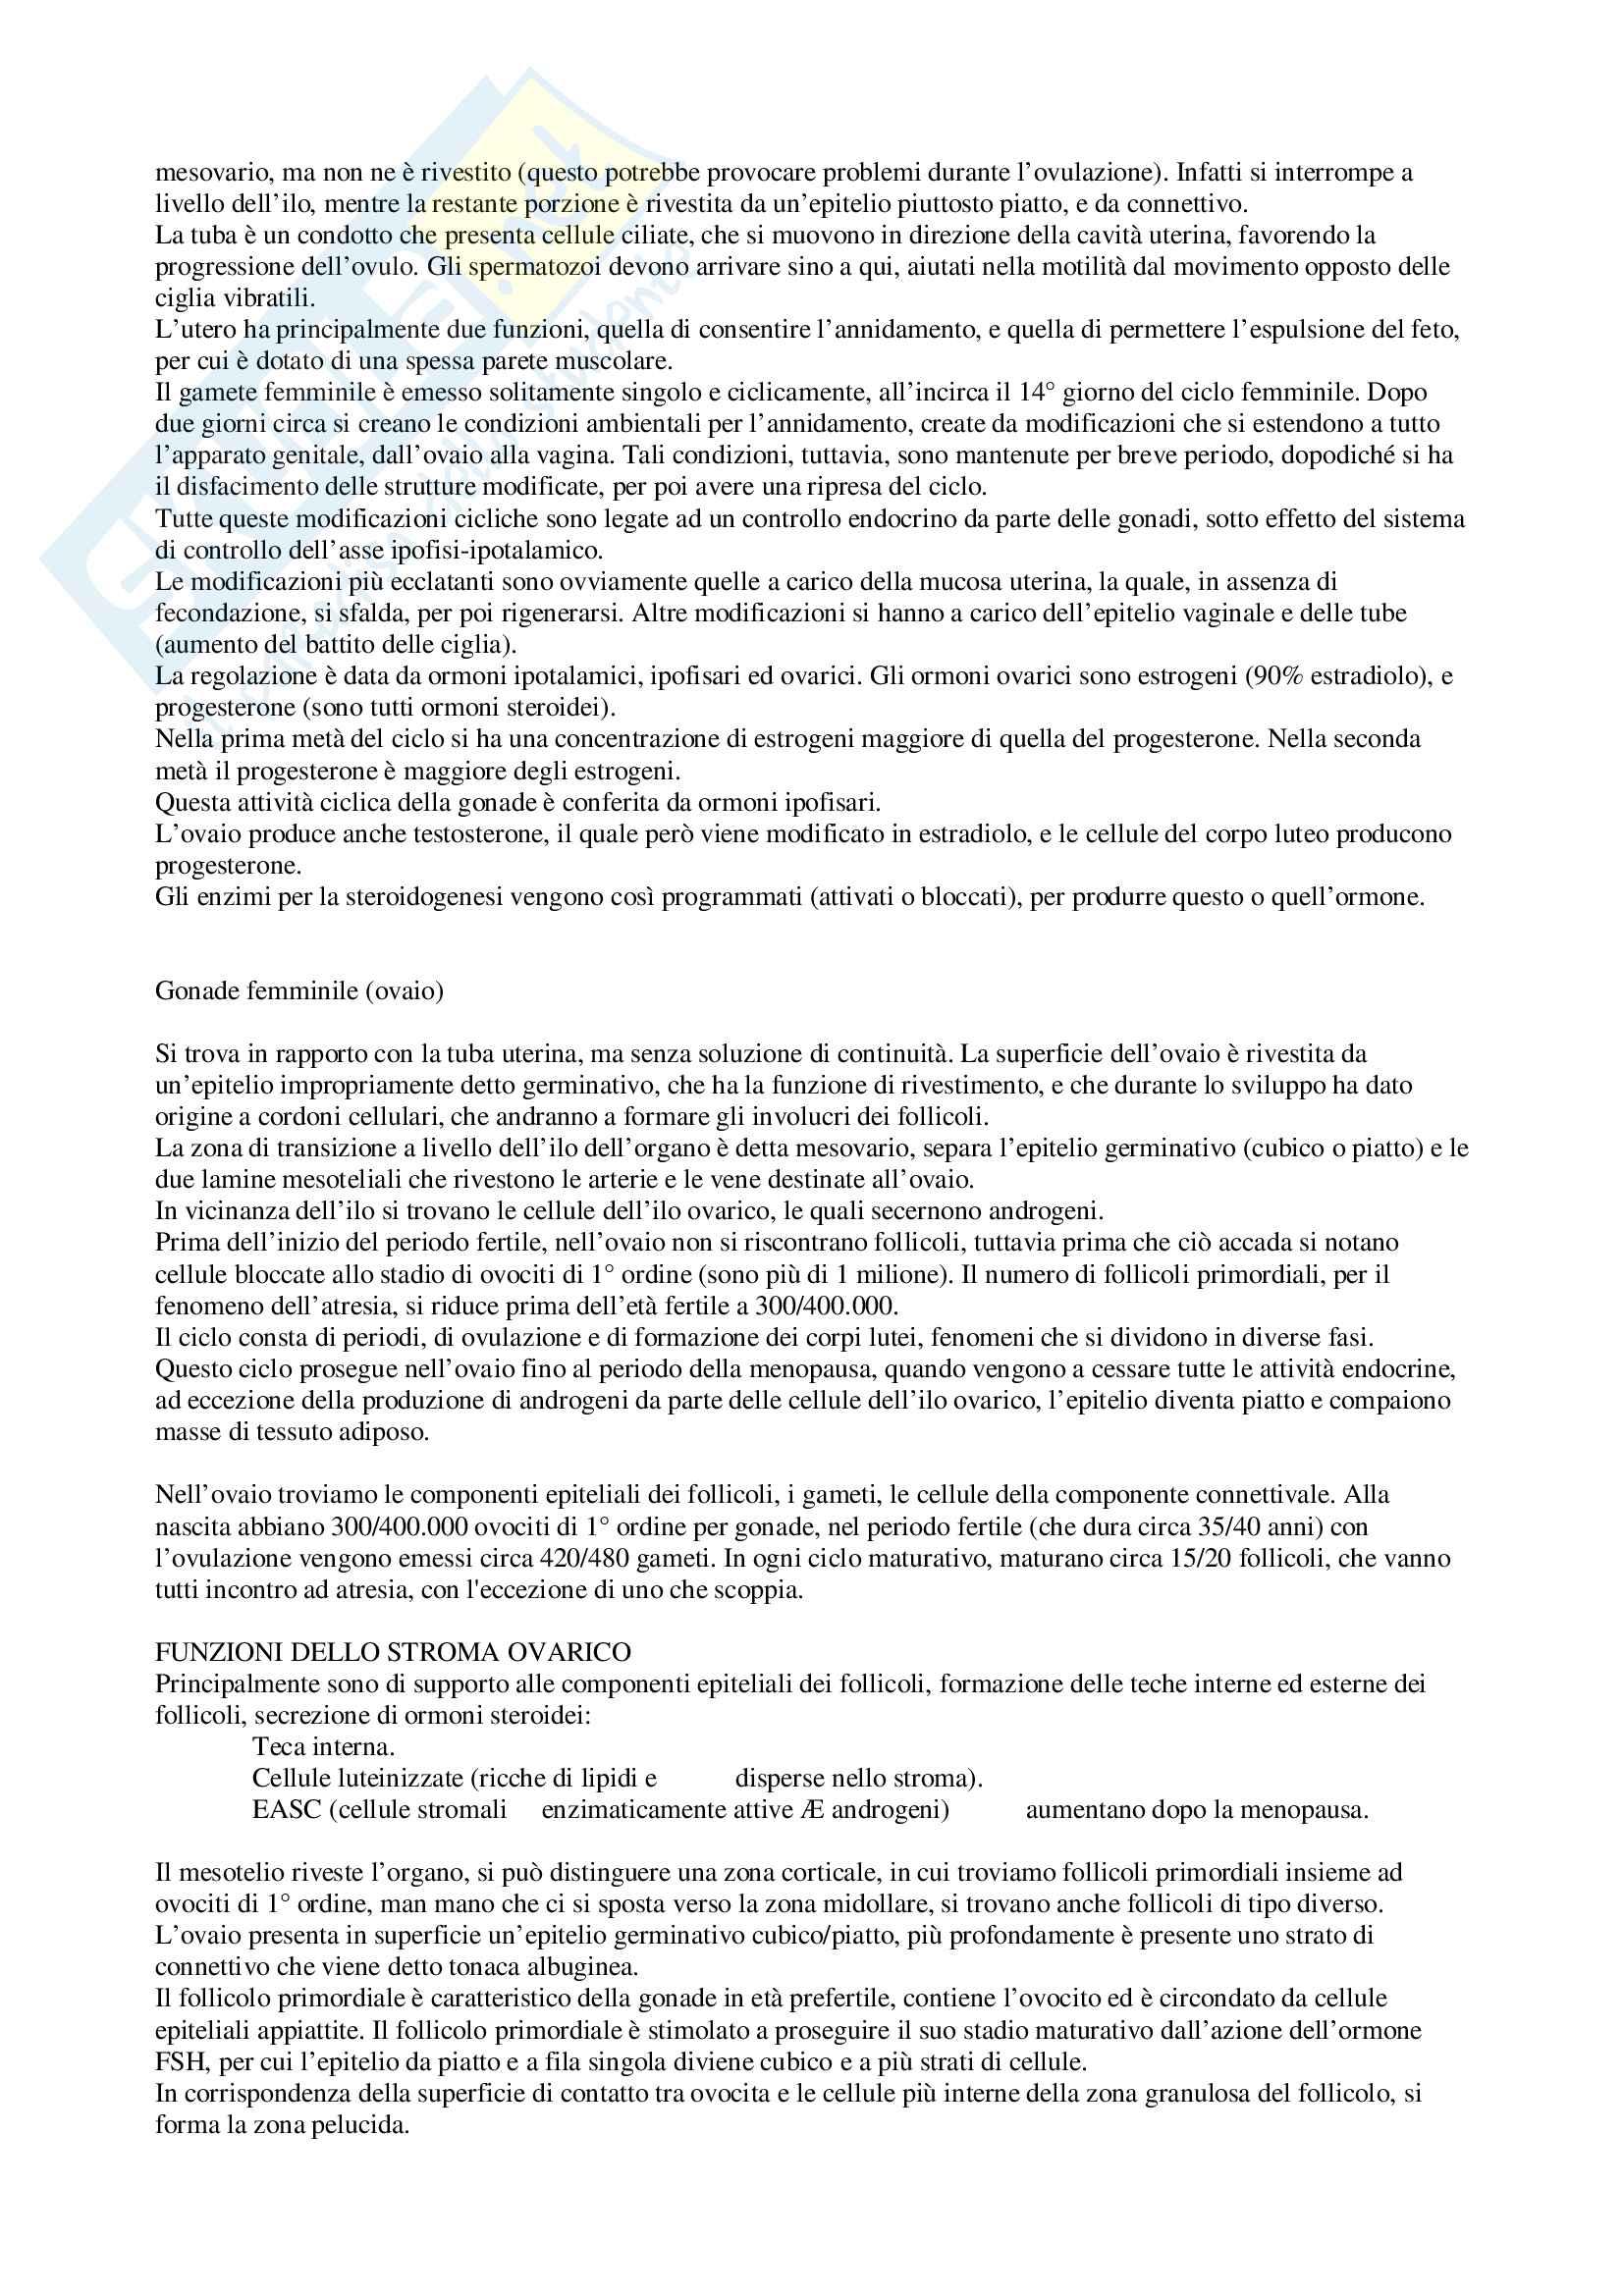 Anatomia - Nozioni generali Pag. 31